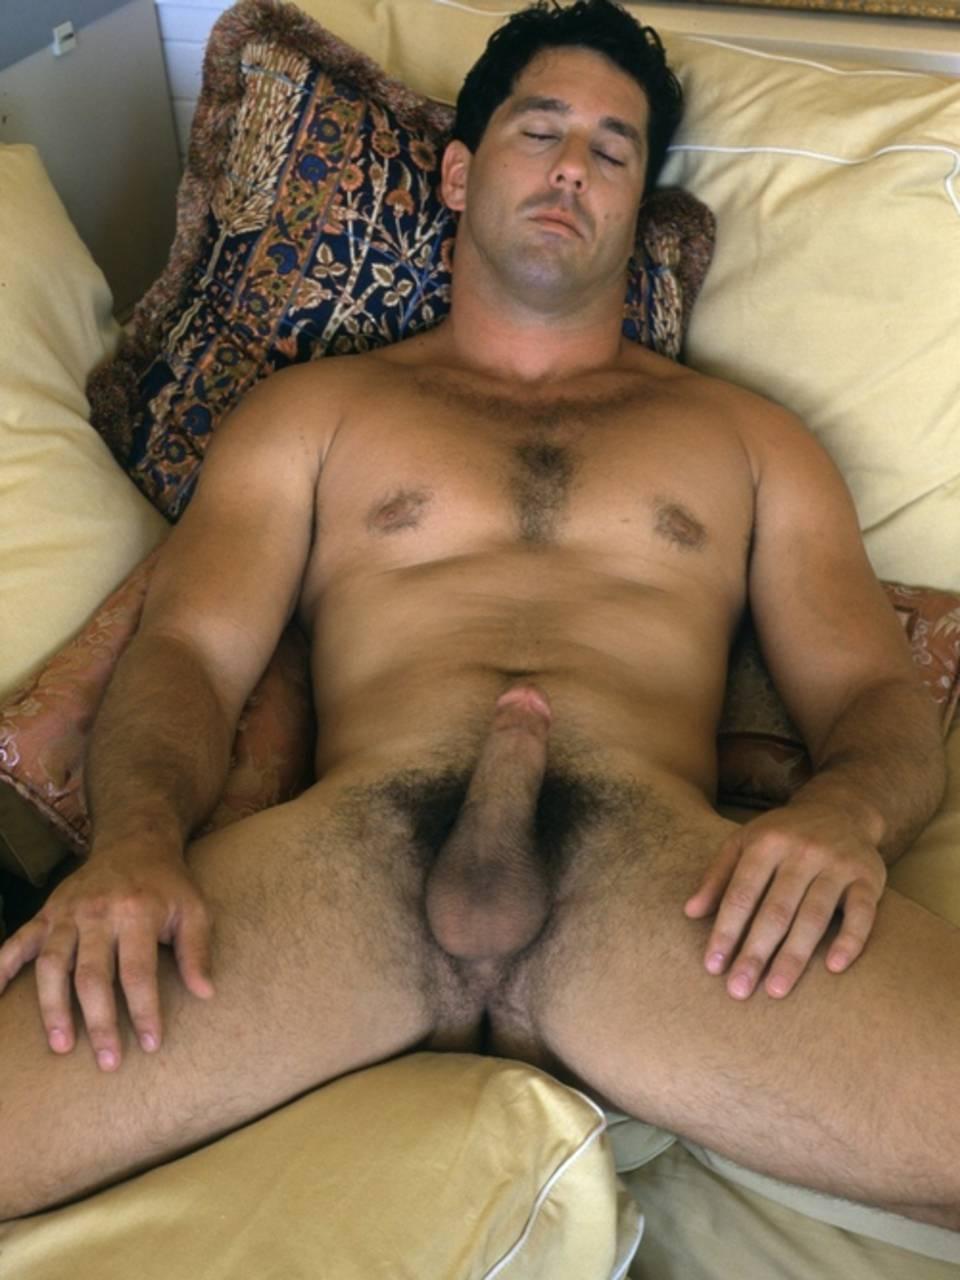 Sex erection pics xxx sexy tube